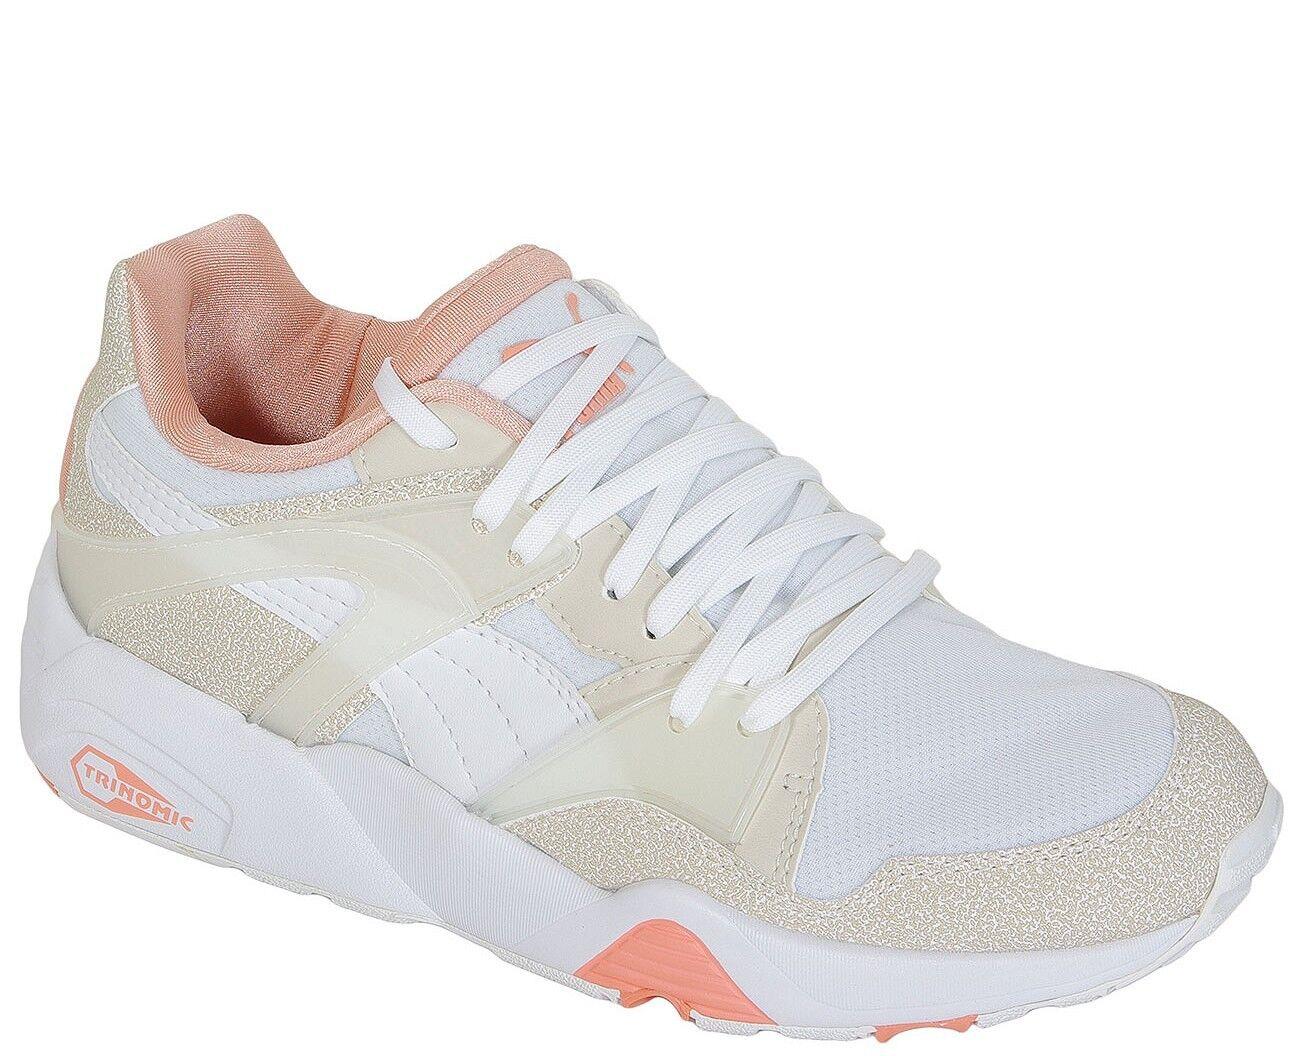 PUMA WHITE BLAZE FILTERED WN S WHITE PUMA 359997 sneakers SALE 7f02fb